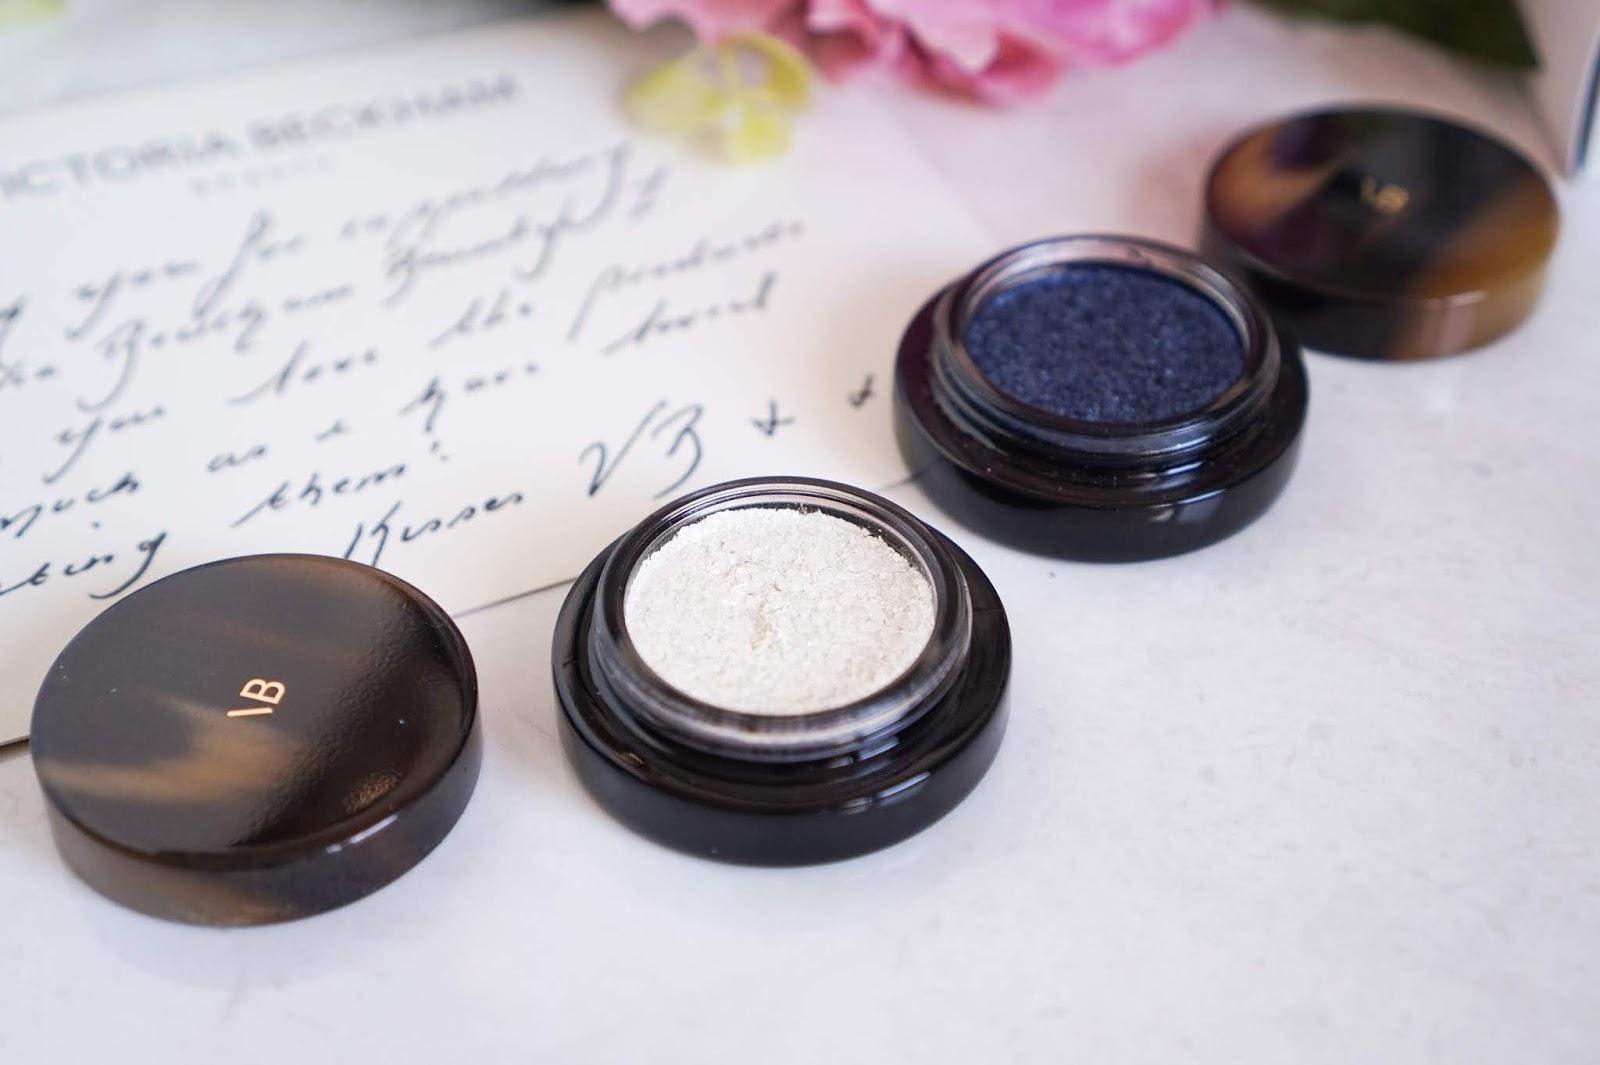 Victoria_Beckham_Beauty_Lid_Lustre_Review